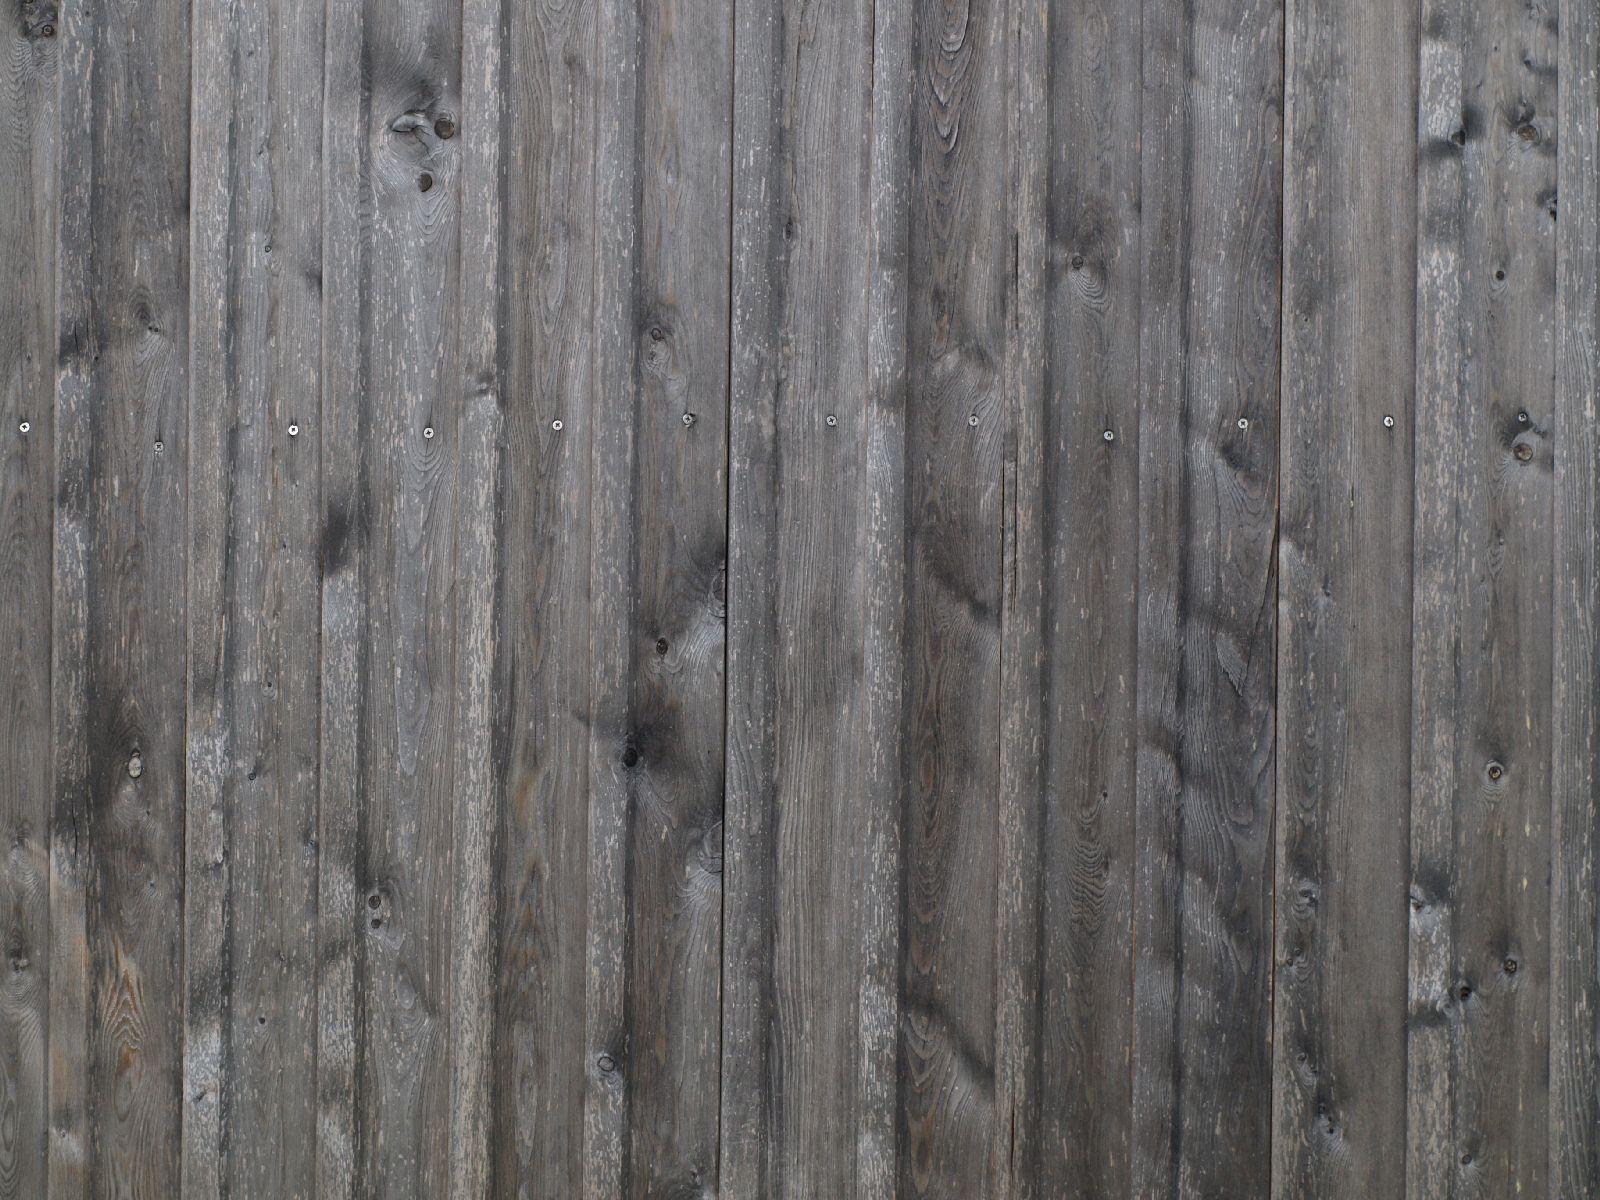 Wood_Texture_A_P6063265